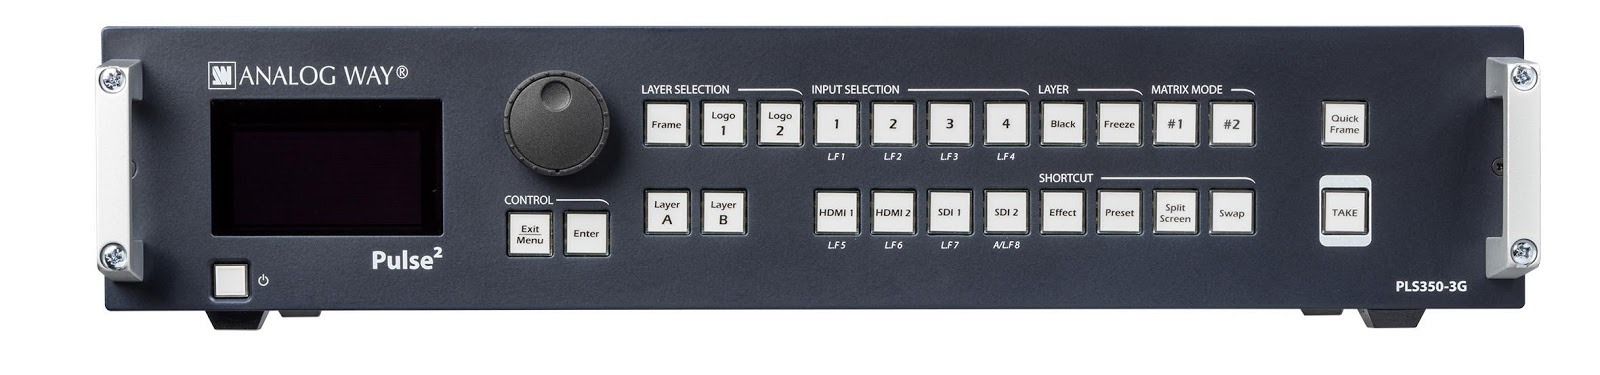 Analog Way PLS350-3G Seamless Switcher/Mixer